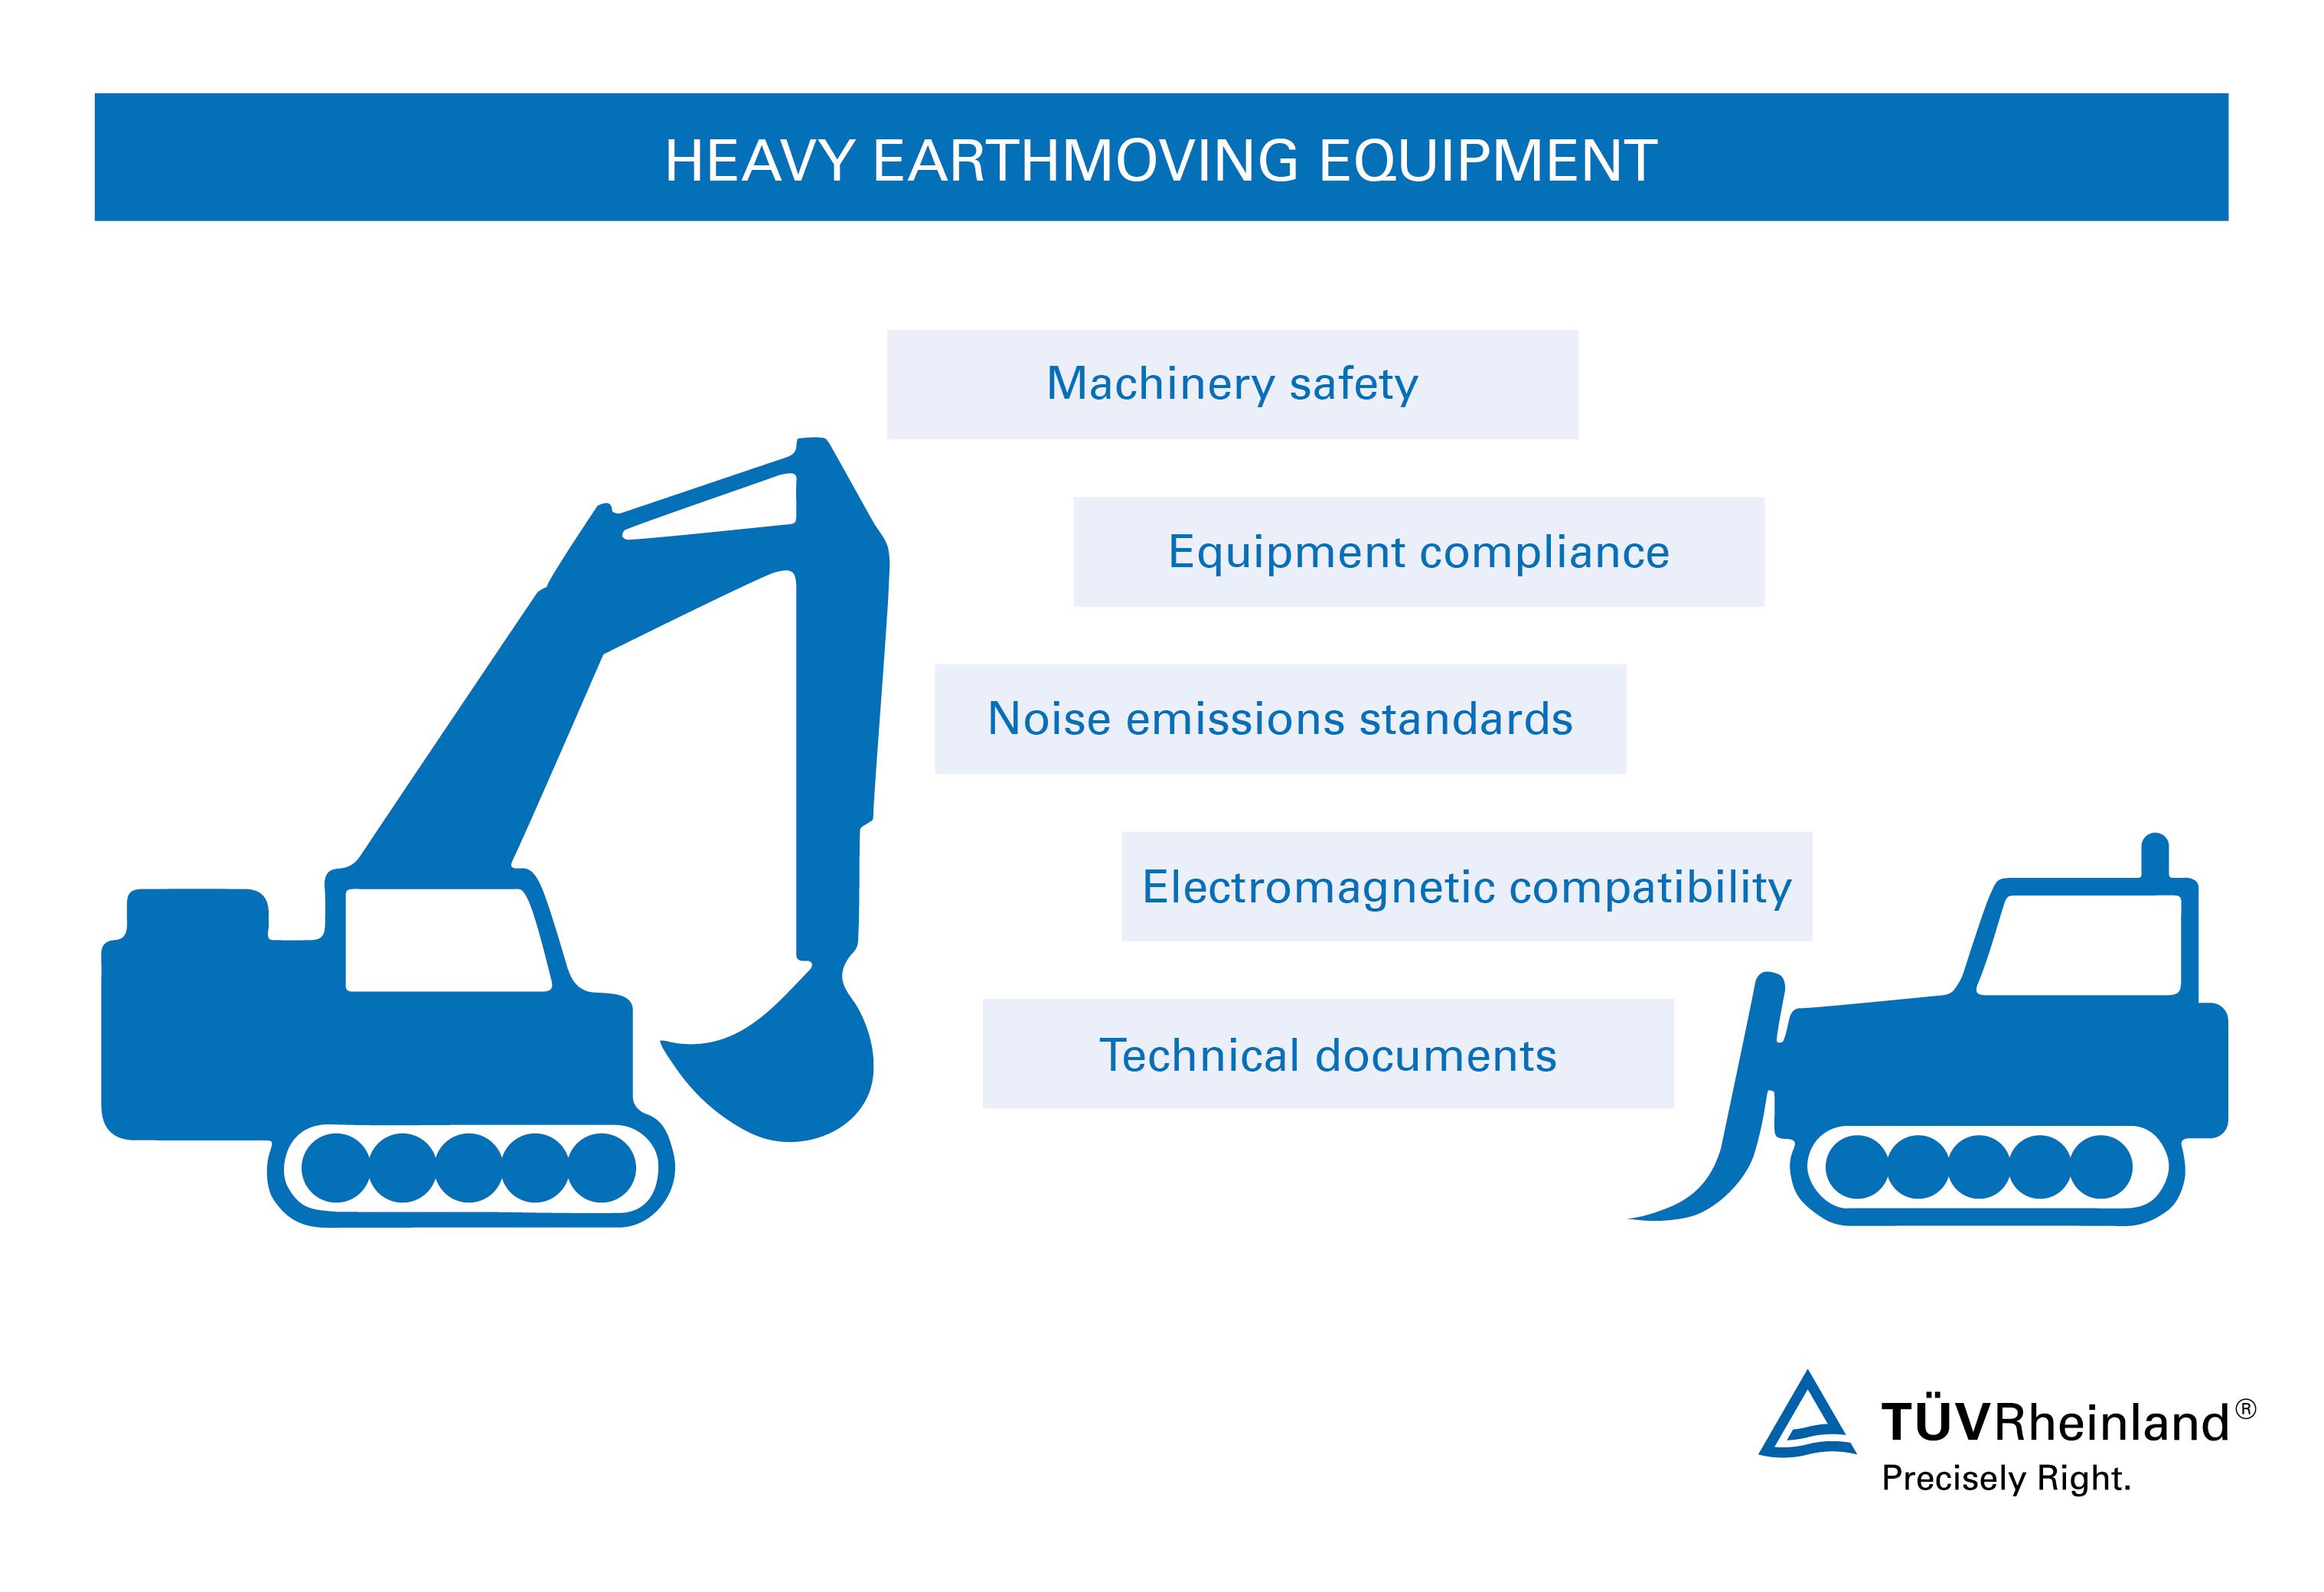 Earthmoving Machinery Testing and Certification | WO | TÜV Rheinland